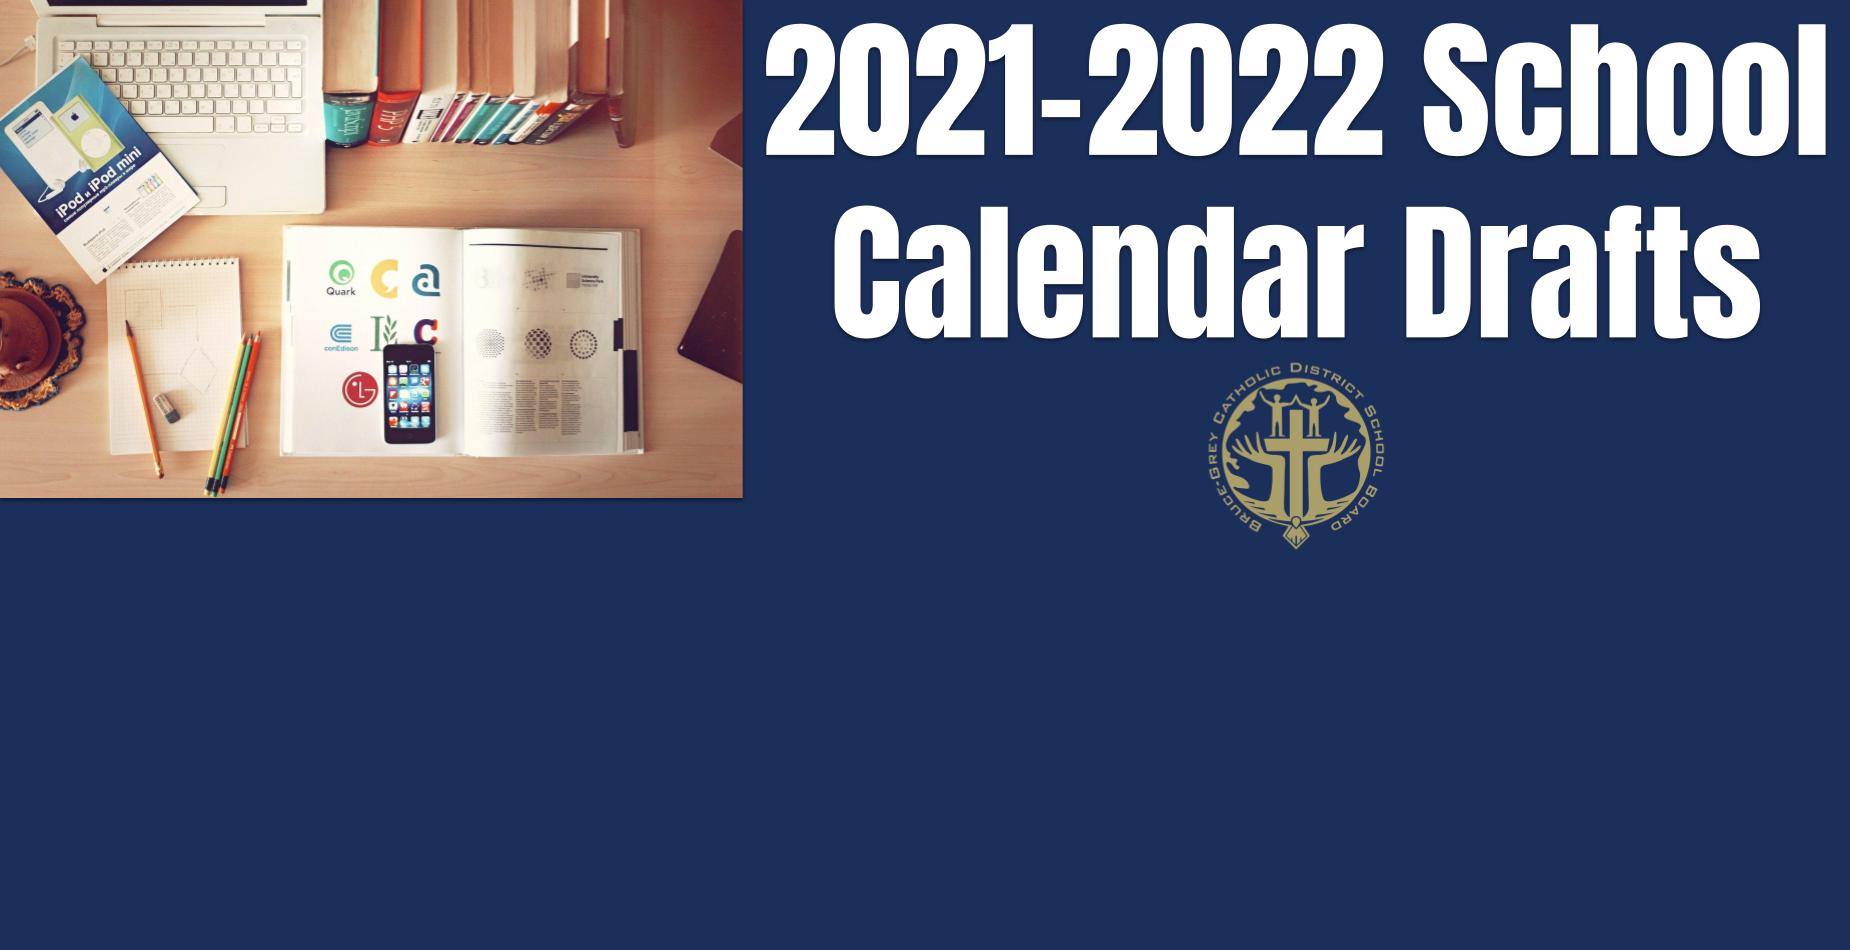 2021-2022 School Calendar Drafts